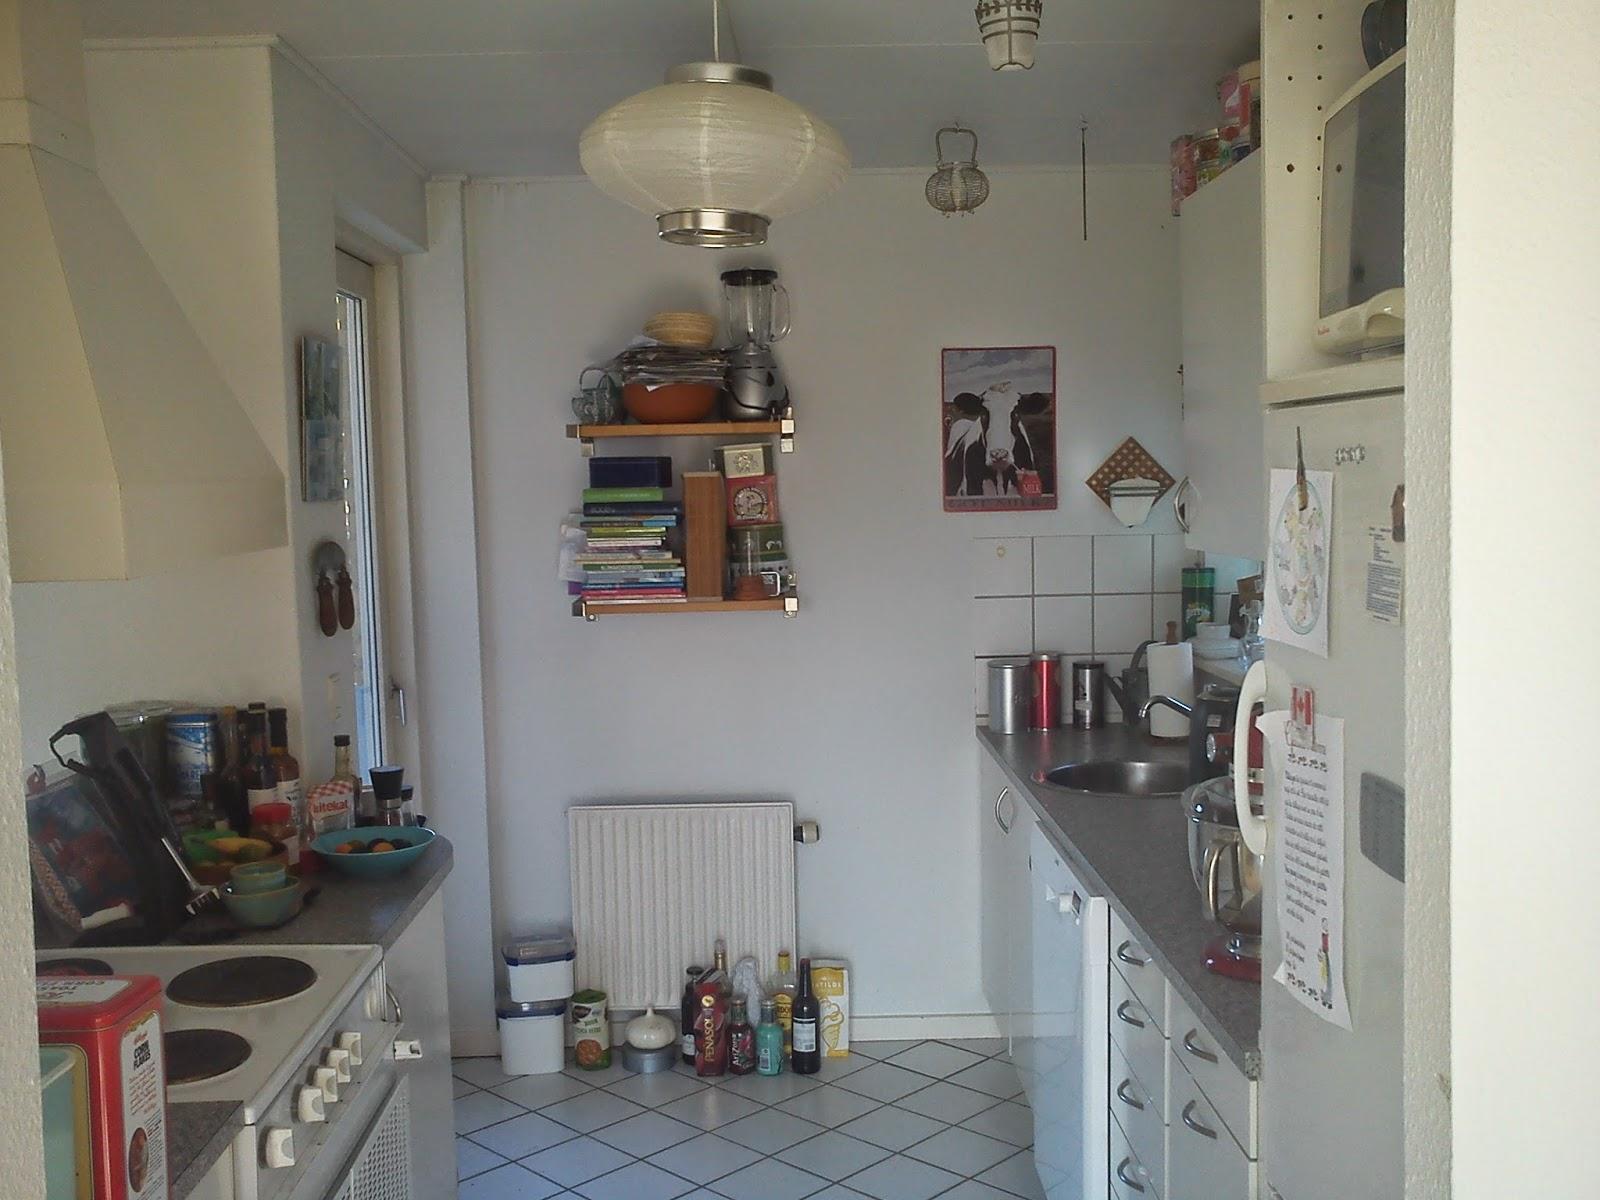 Kitchen of kiki: september 2014